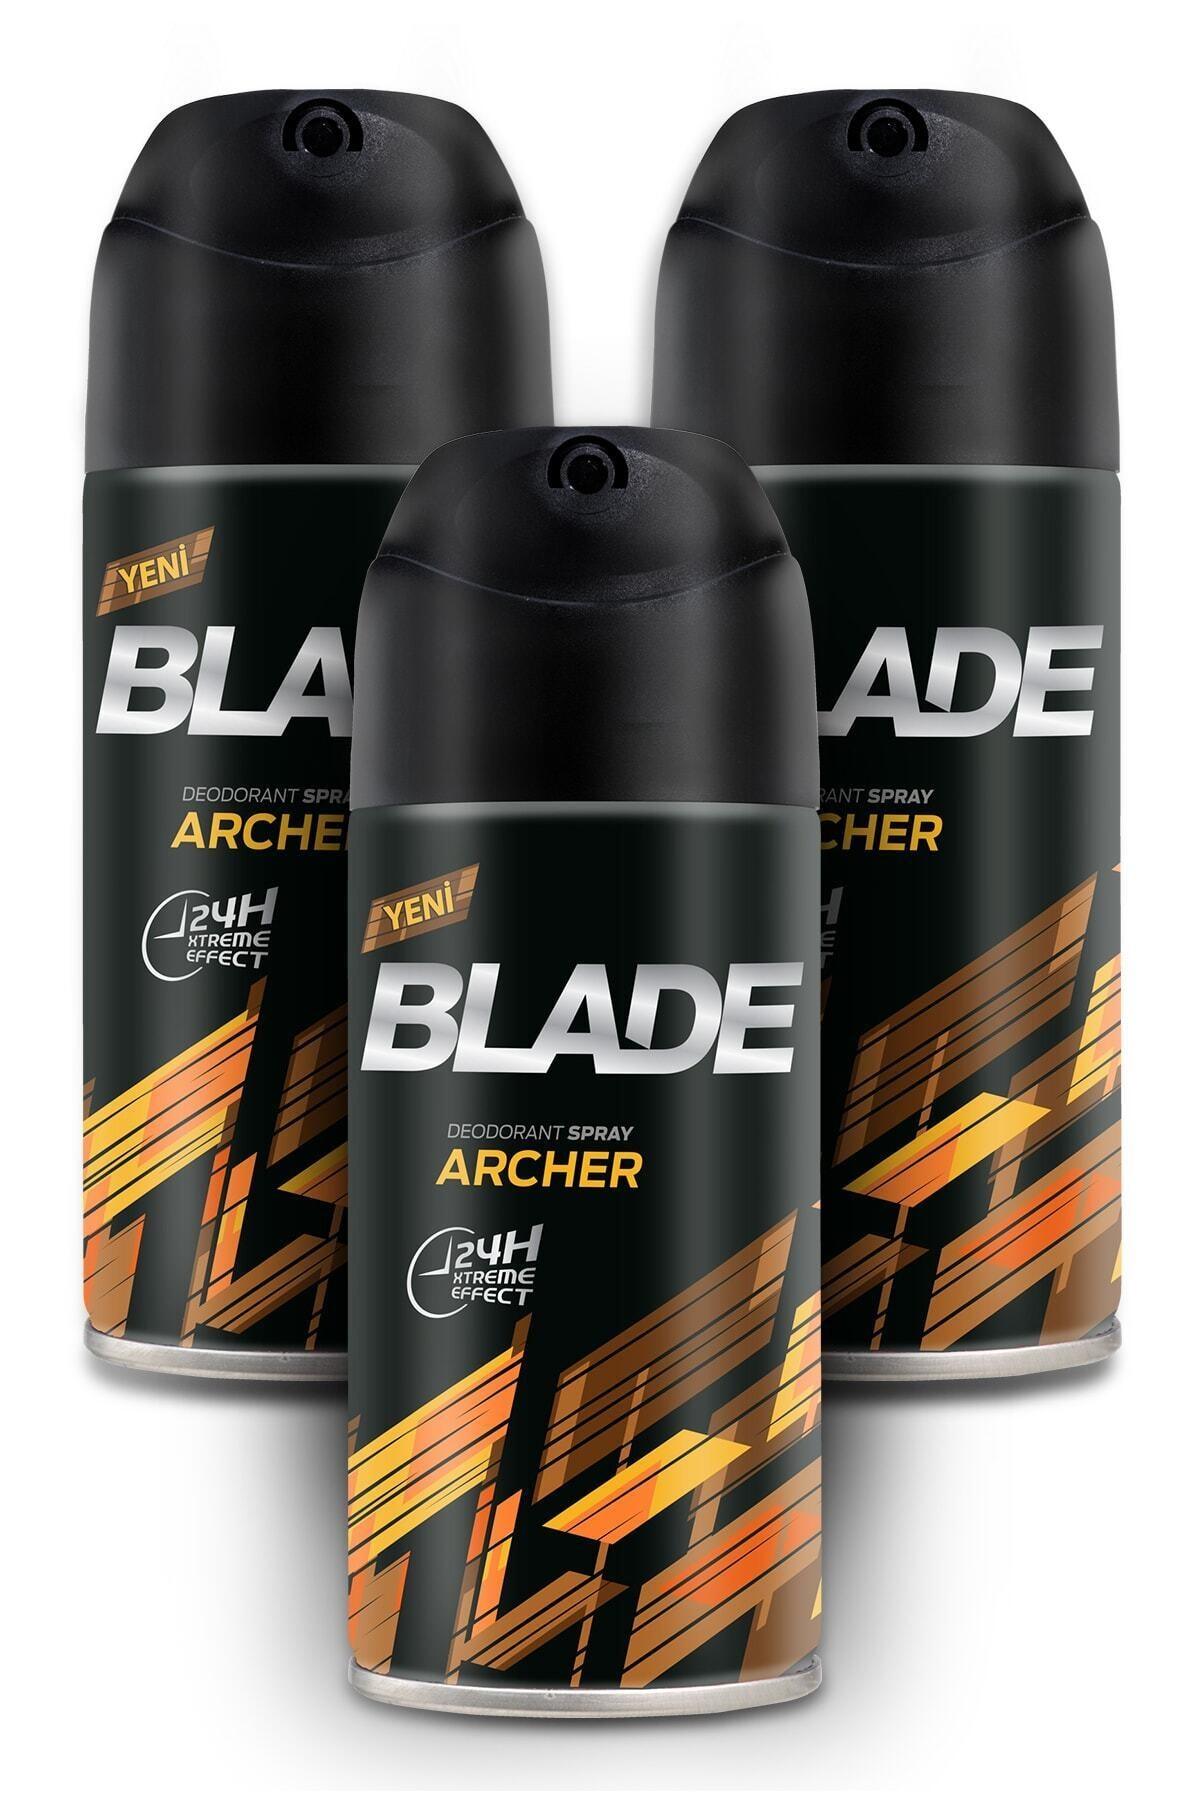 Blade Archer Erkek Deodorant 3x150ml 1